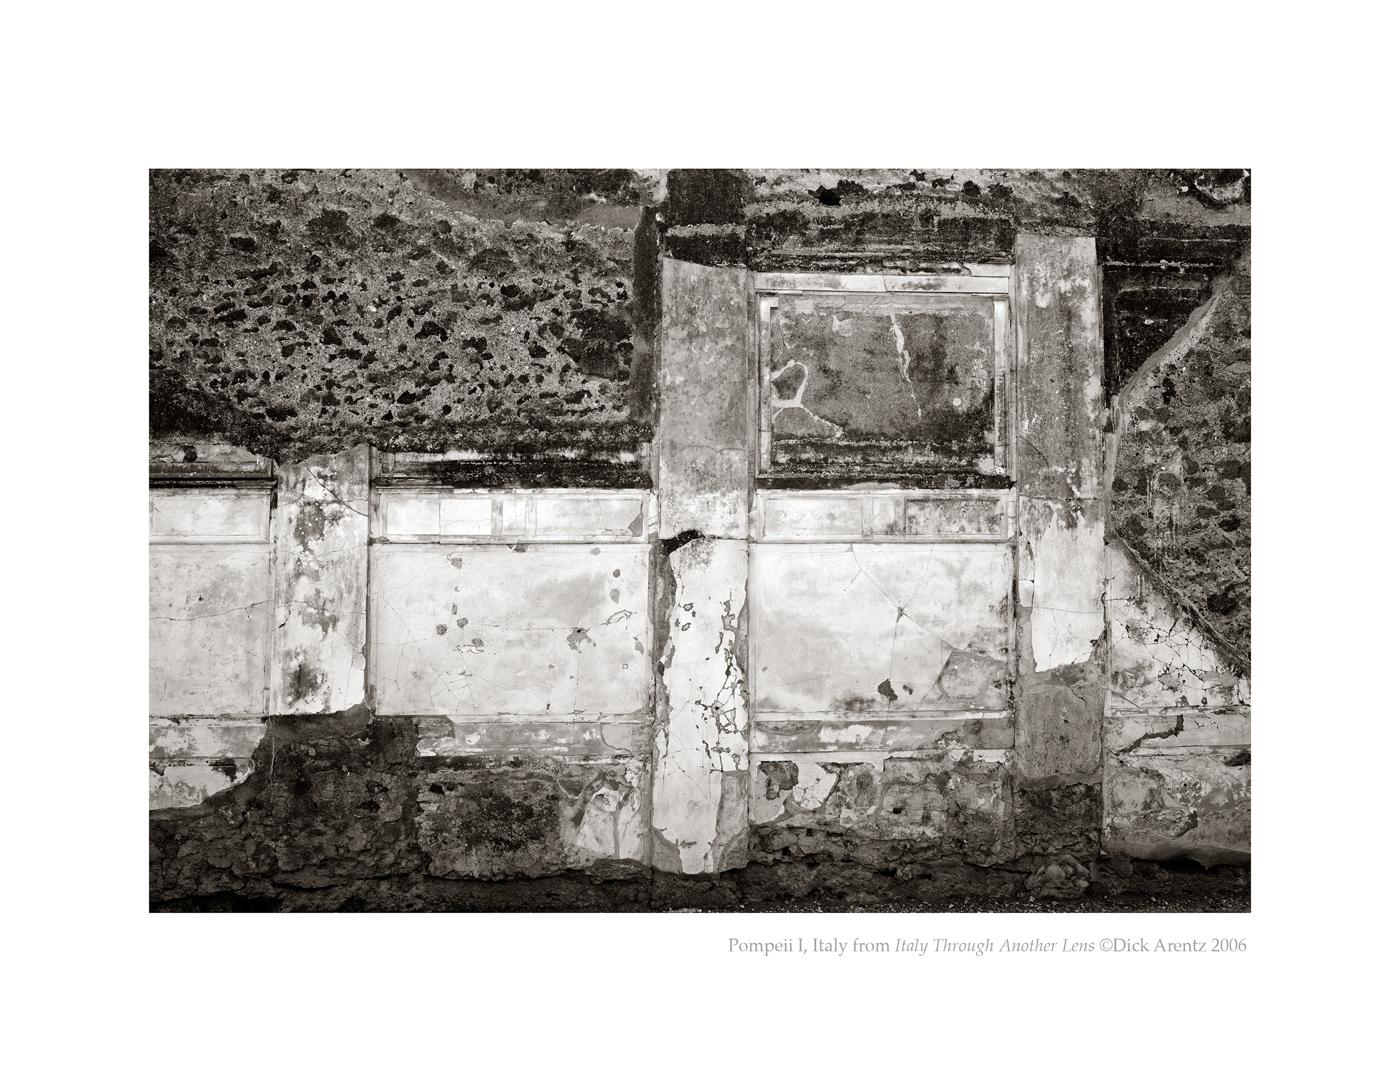 Pompeii I, Italy - Italy Through Another Lens